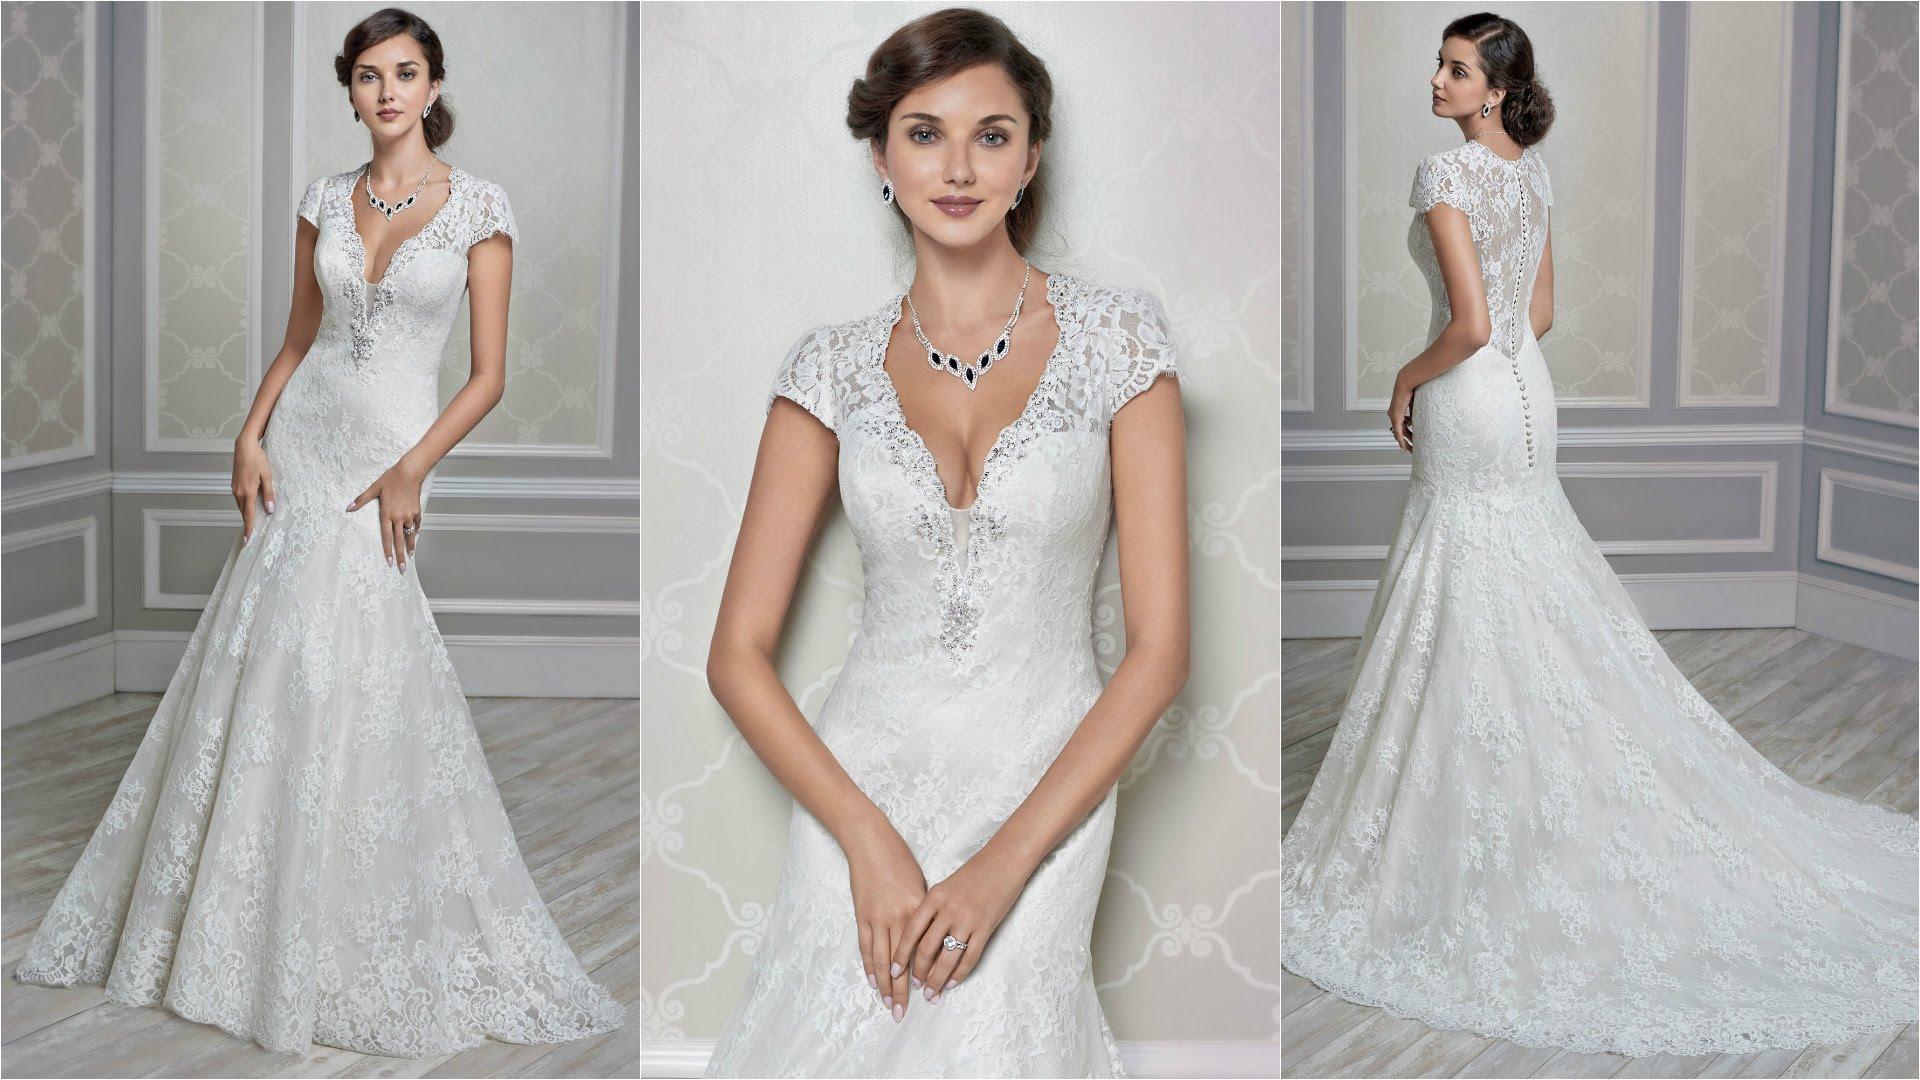 Asian wedding dress asian wedding dresses | cute wedding dresses | royal wedding dresses | wedding  dresses FROITHK